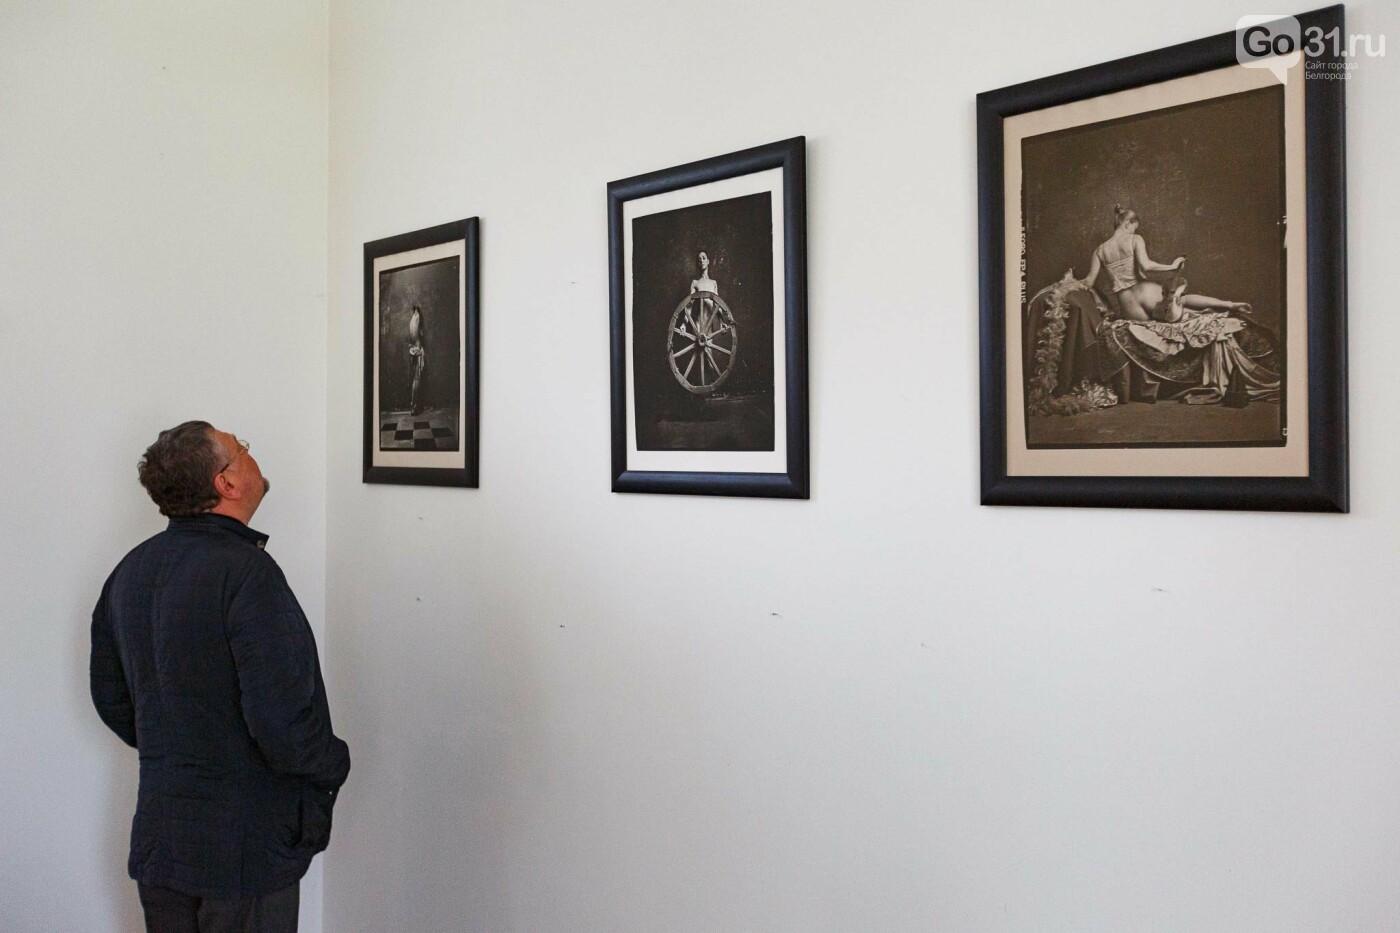 На выставке «1/4 времени» Павла Титовича, Фото: Антон Вергун